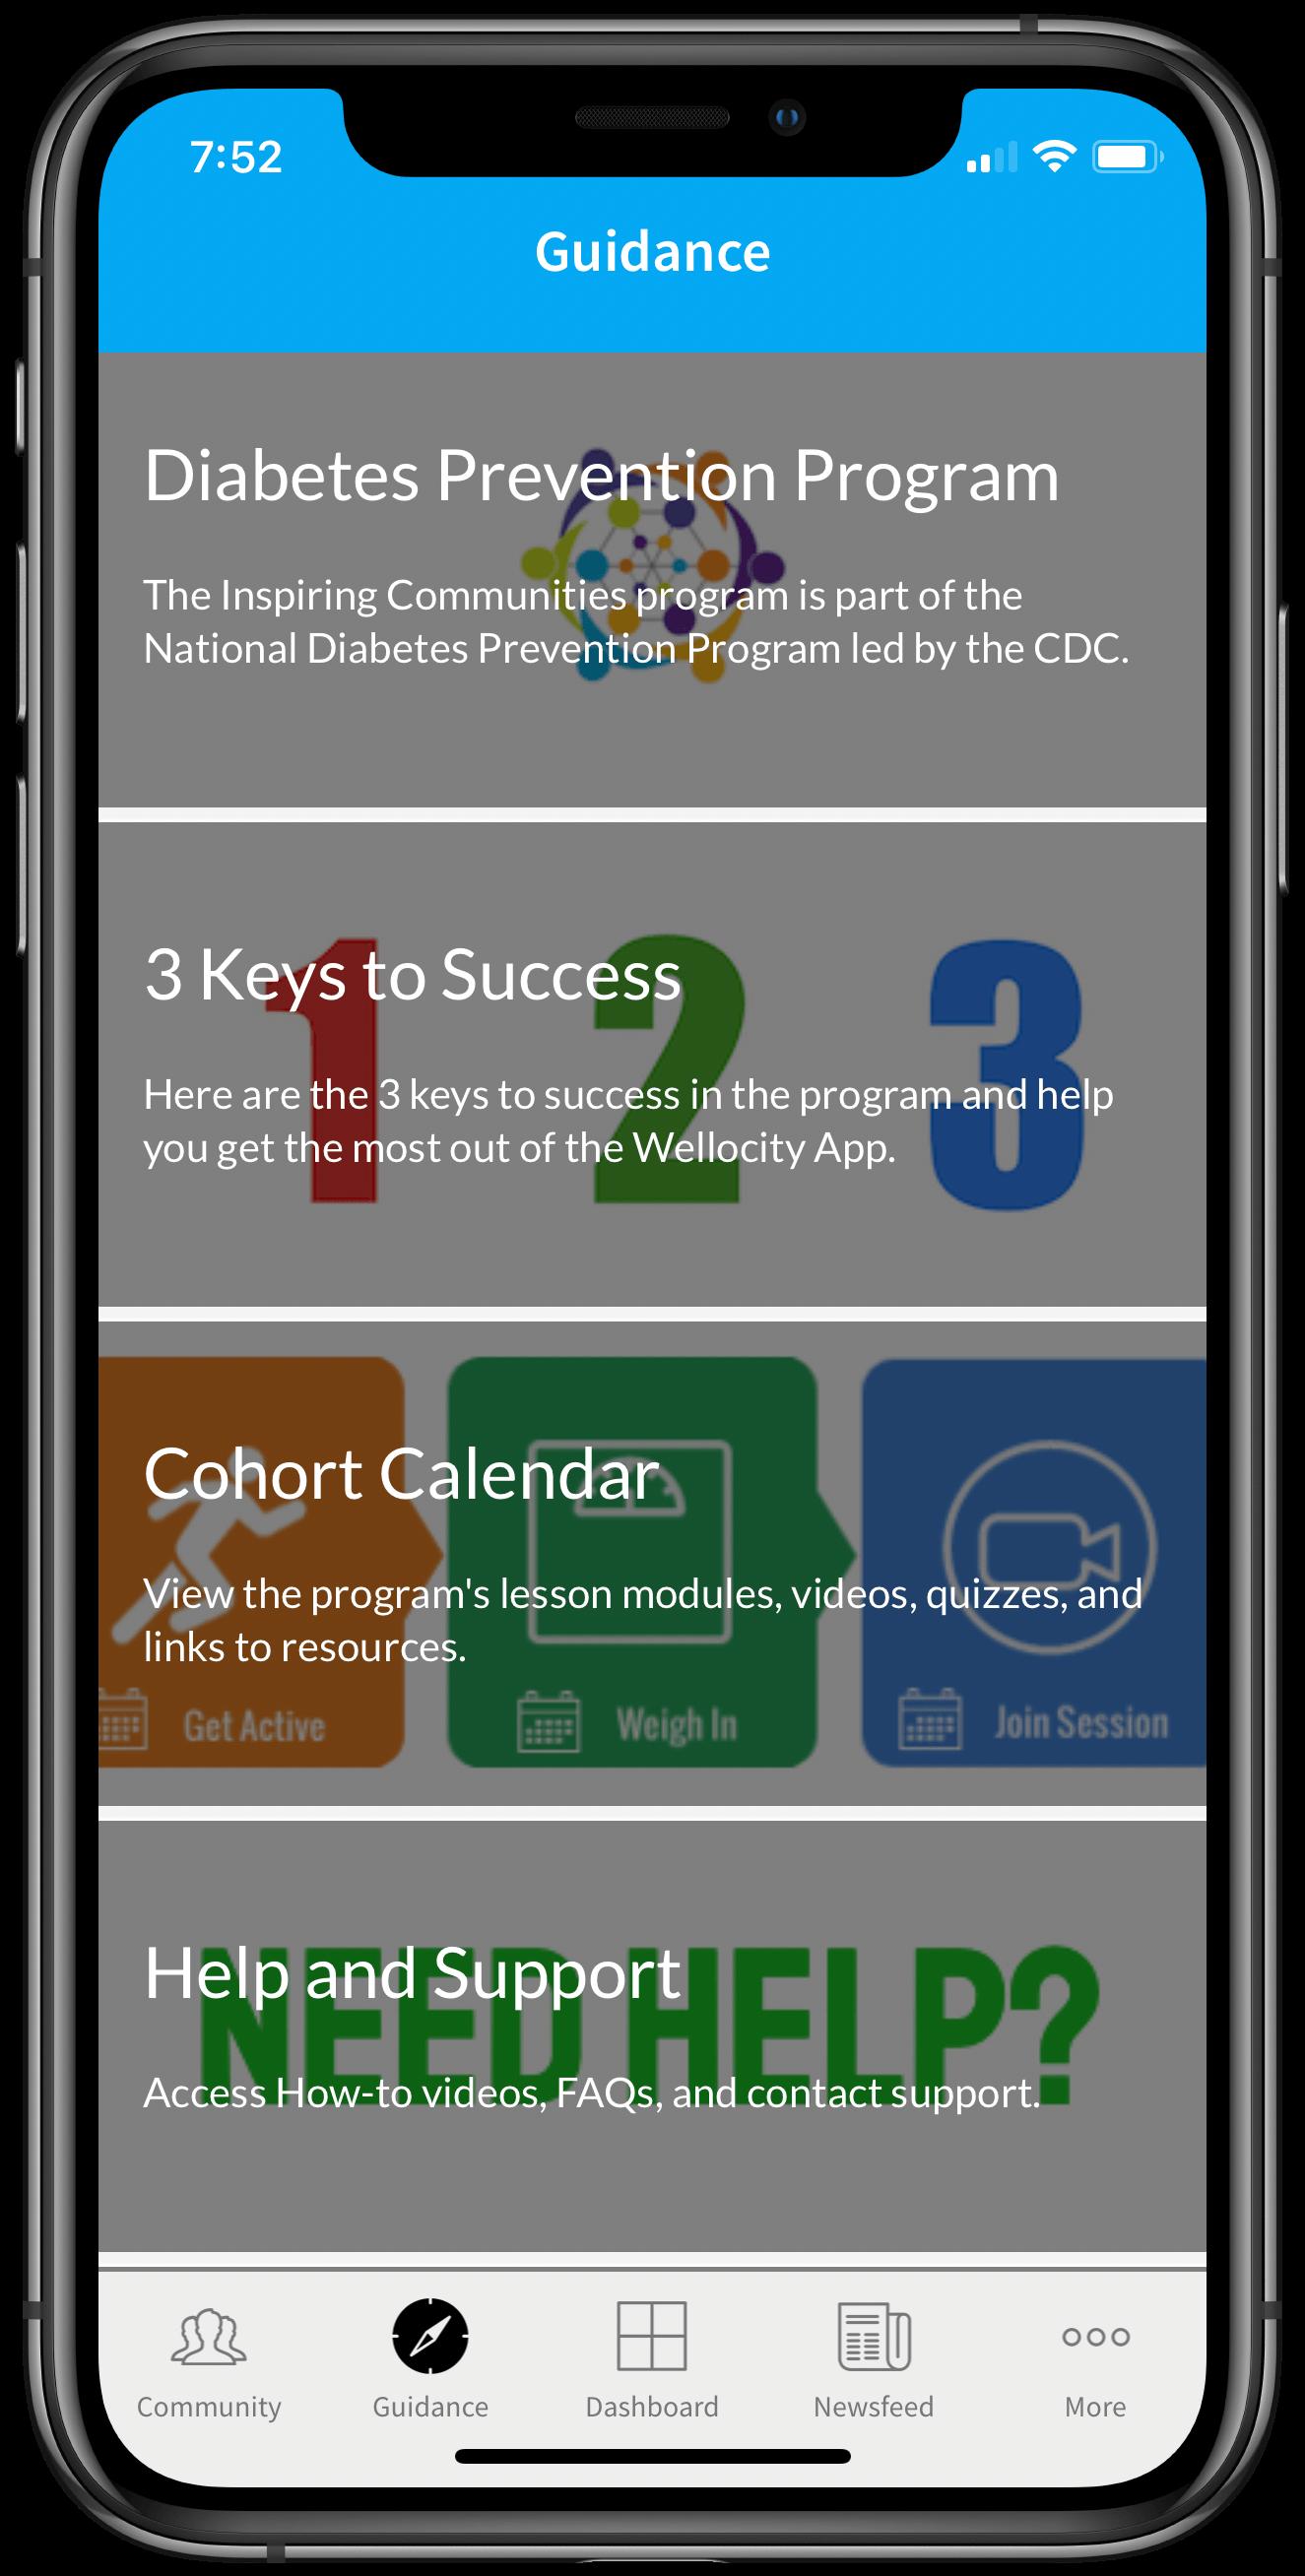 Inspiring Communities English Guidance framed iPhone XS